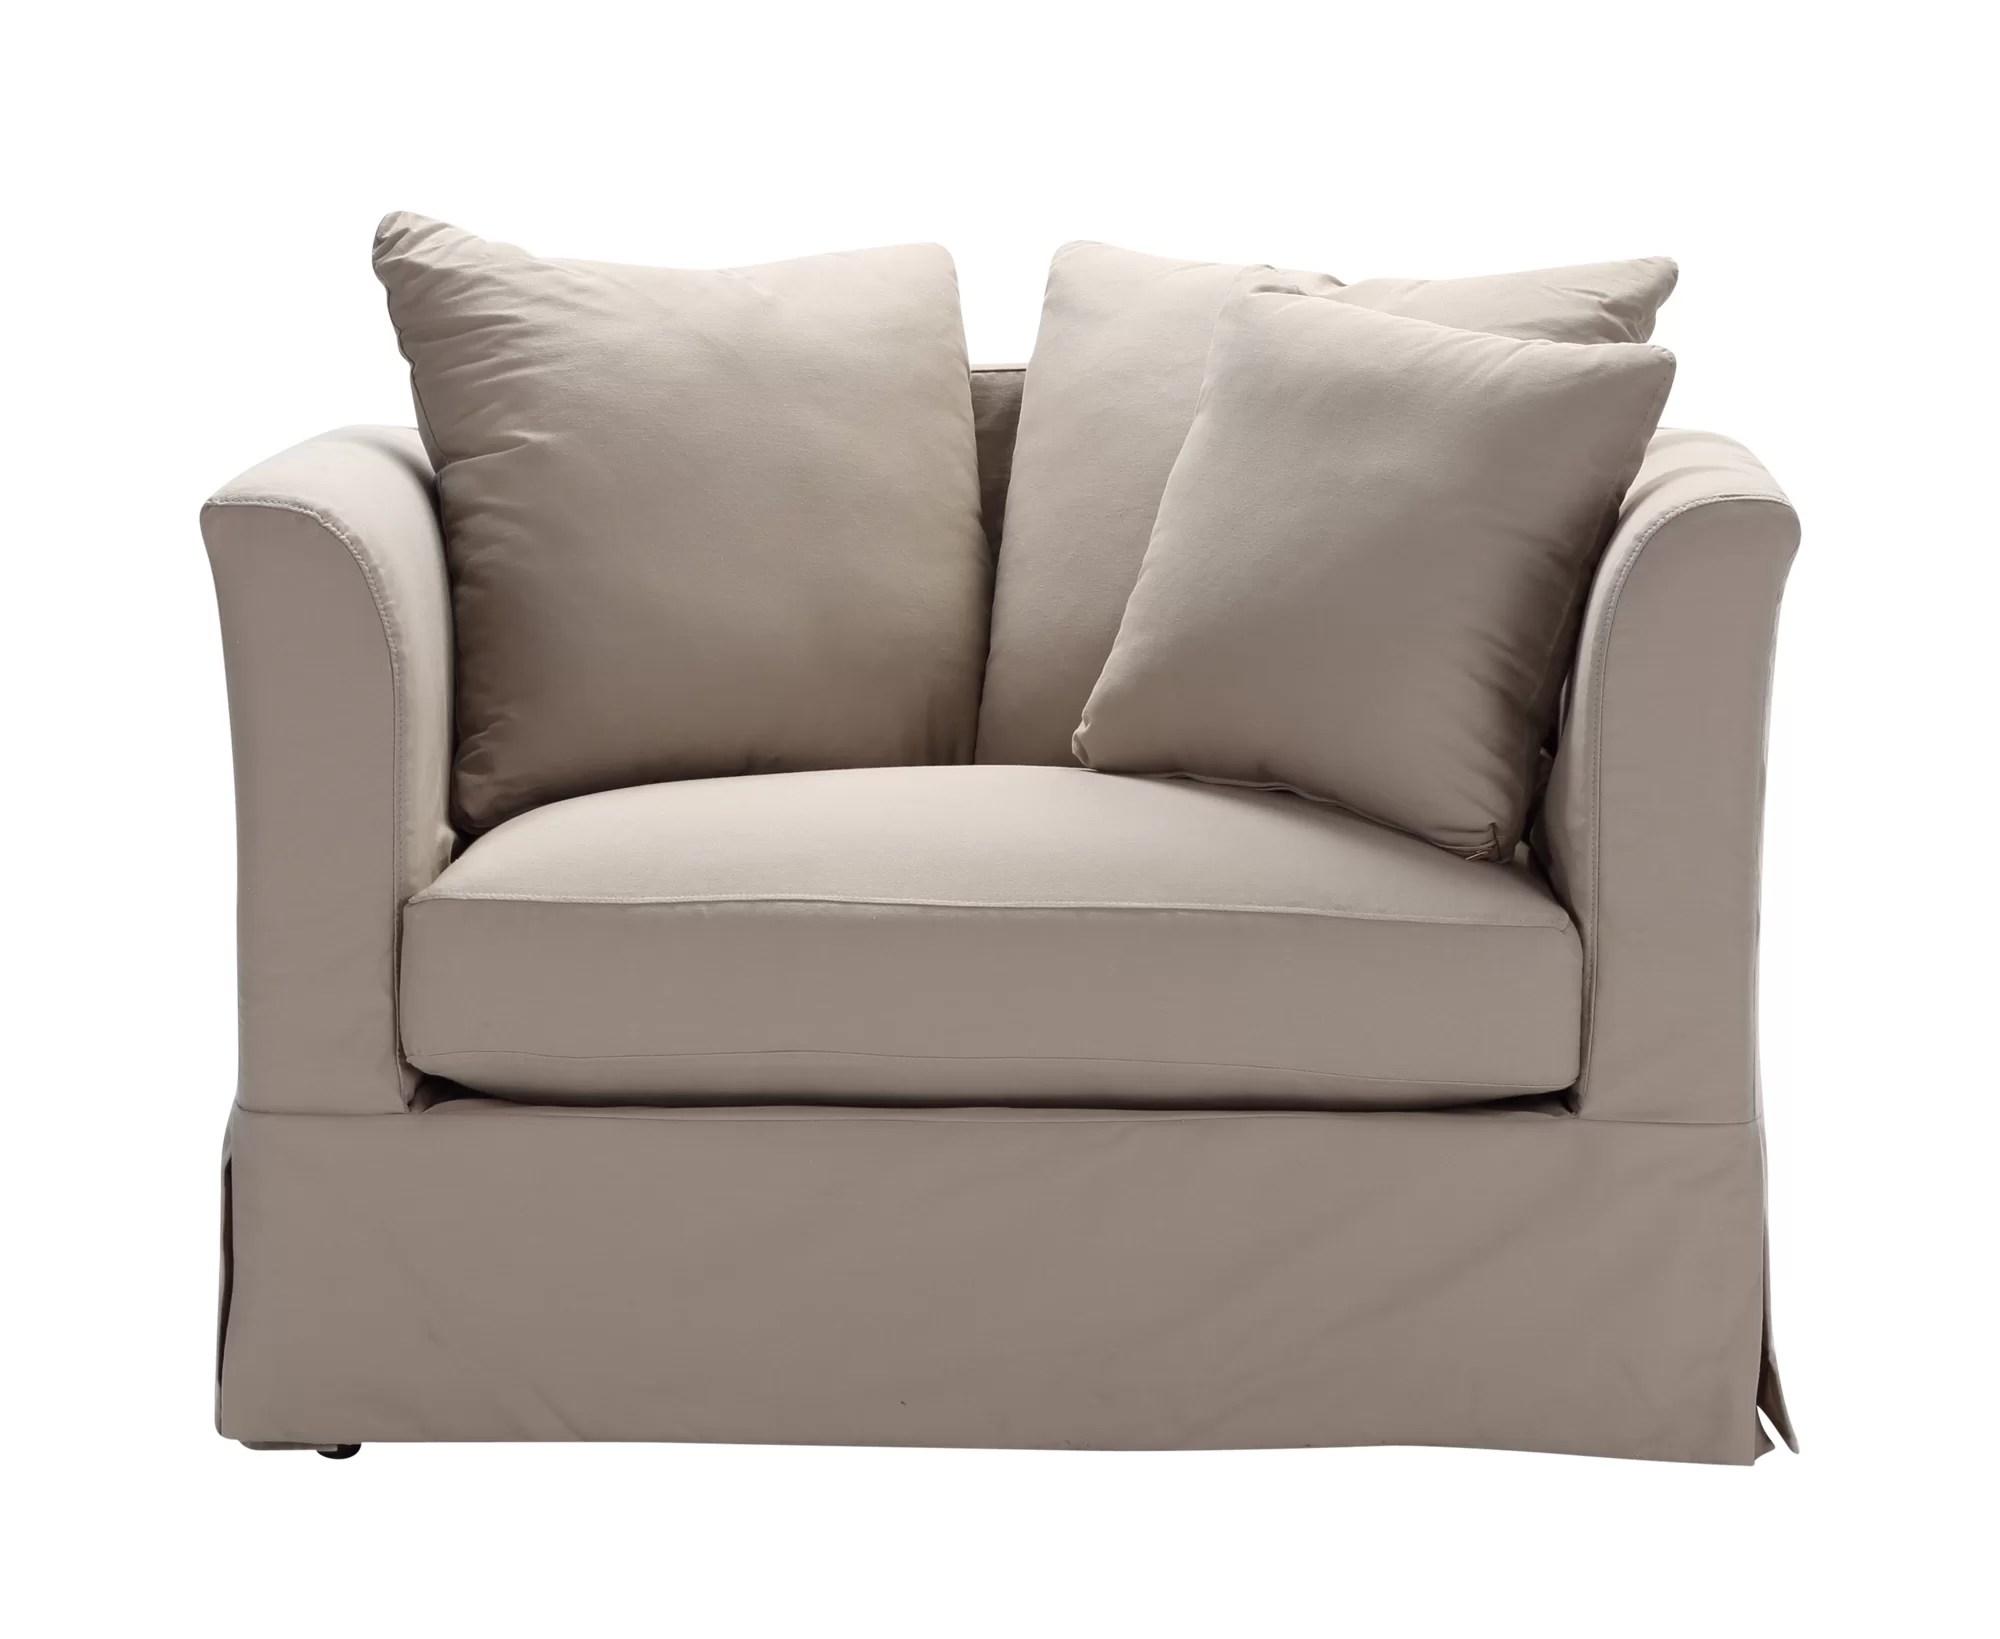 chair and a half sleeper evac 300h mk4 highland dunes dianne wayfair